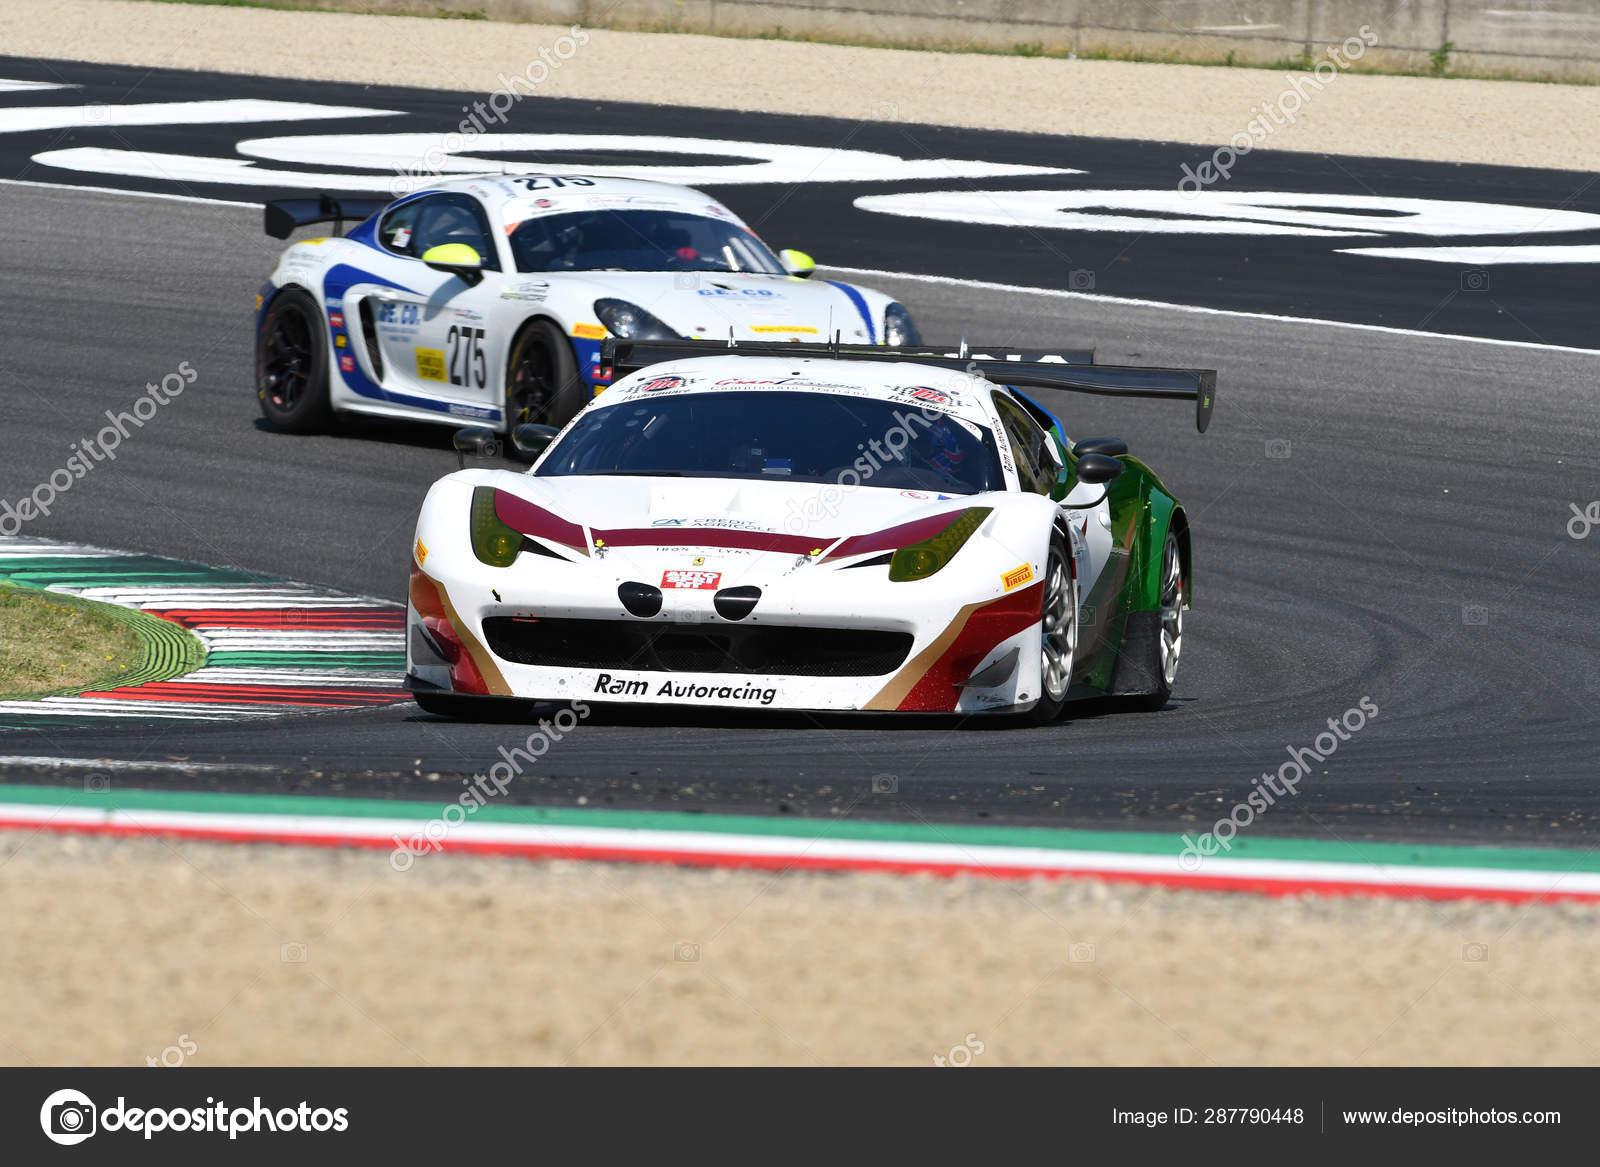 Mugello Circuit Italy July 2019 Ferrari 458 Gt3 Iron Linx Stock Editorial Photo C Dan74 287790448